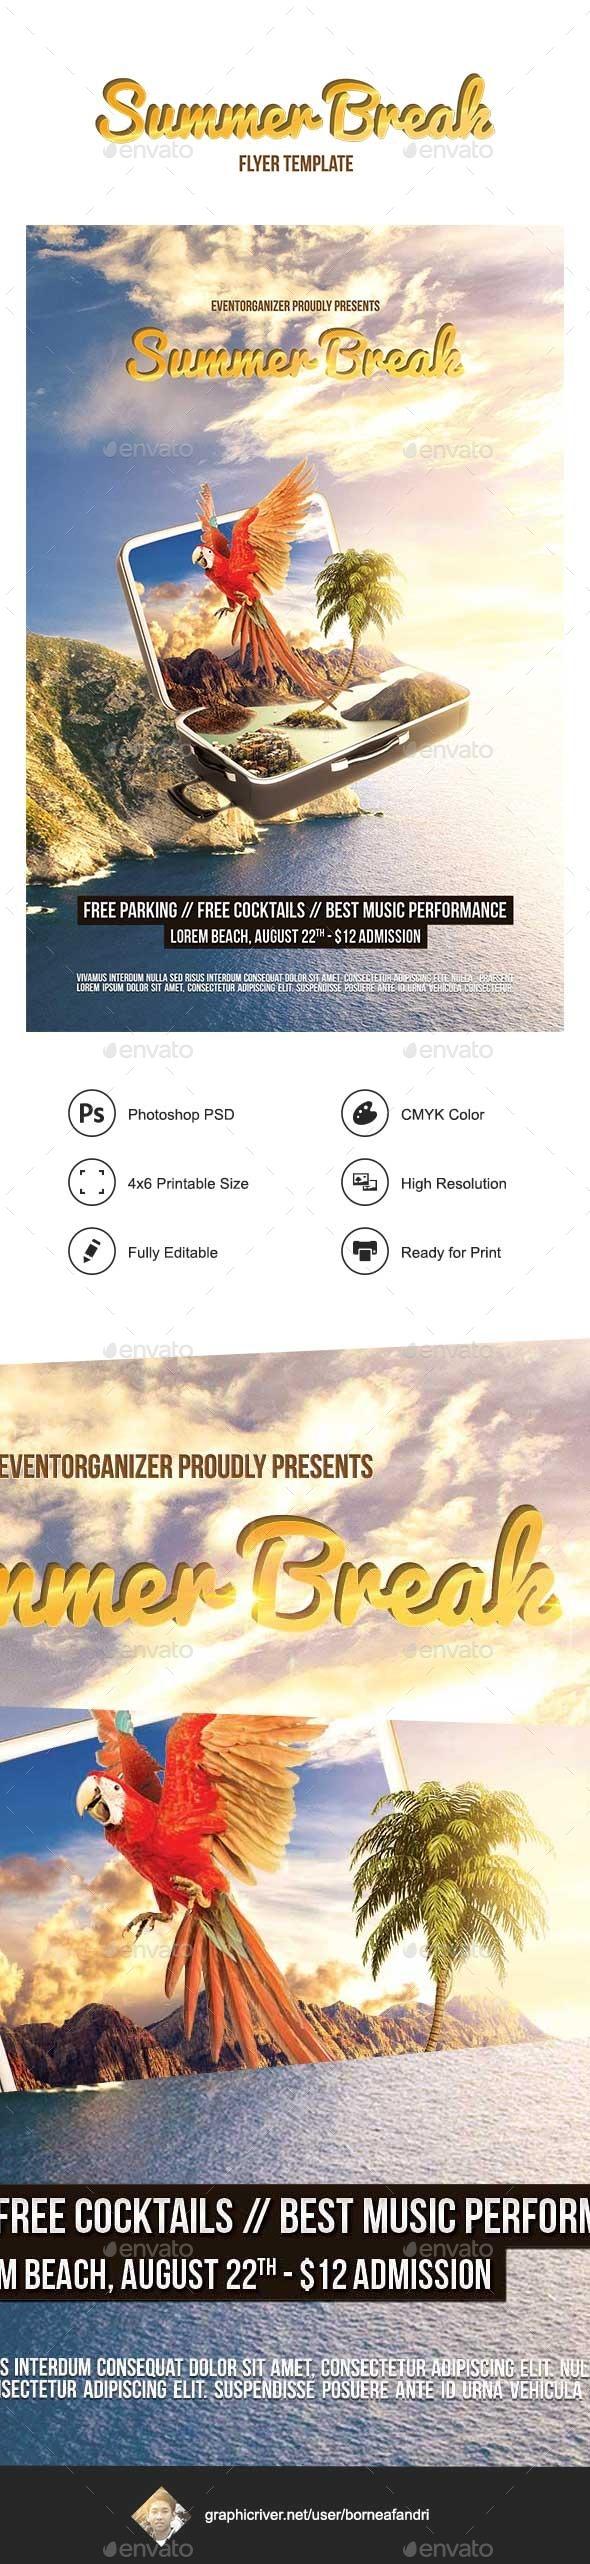 GraphicRiver Summer Break Flyer 10772928